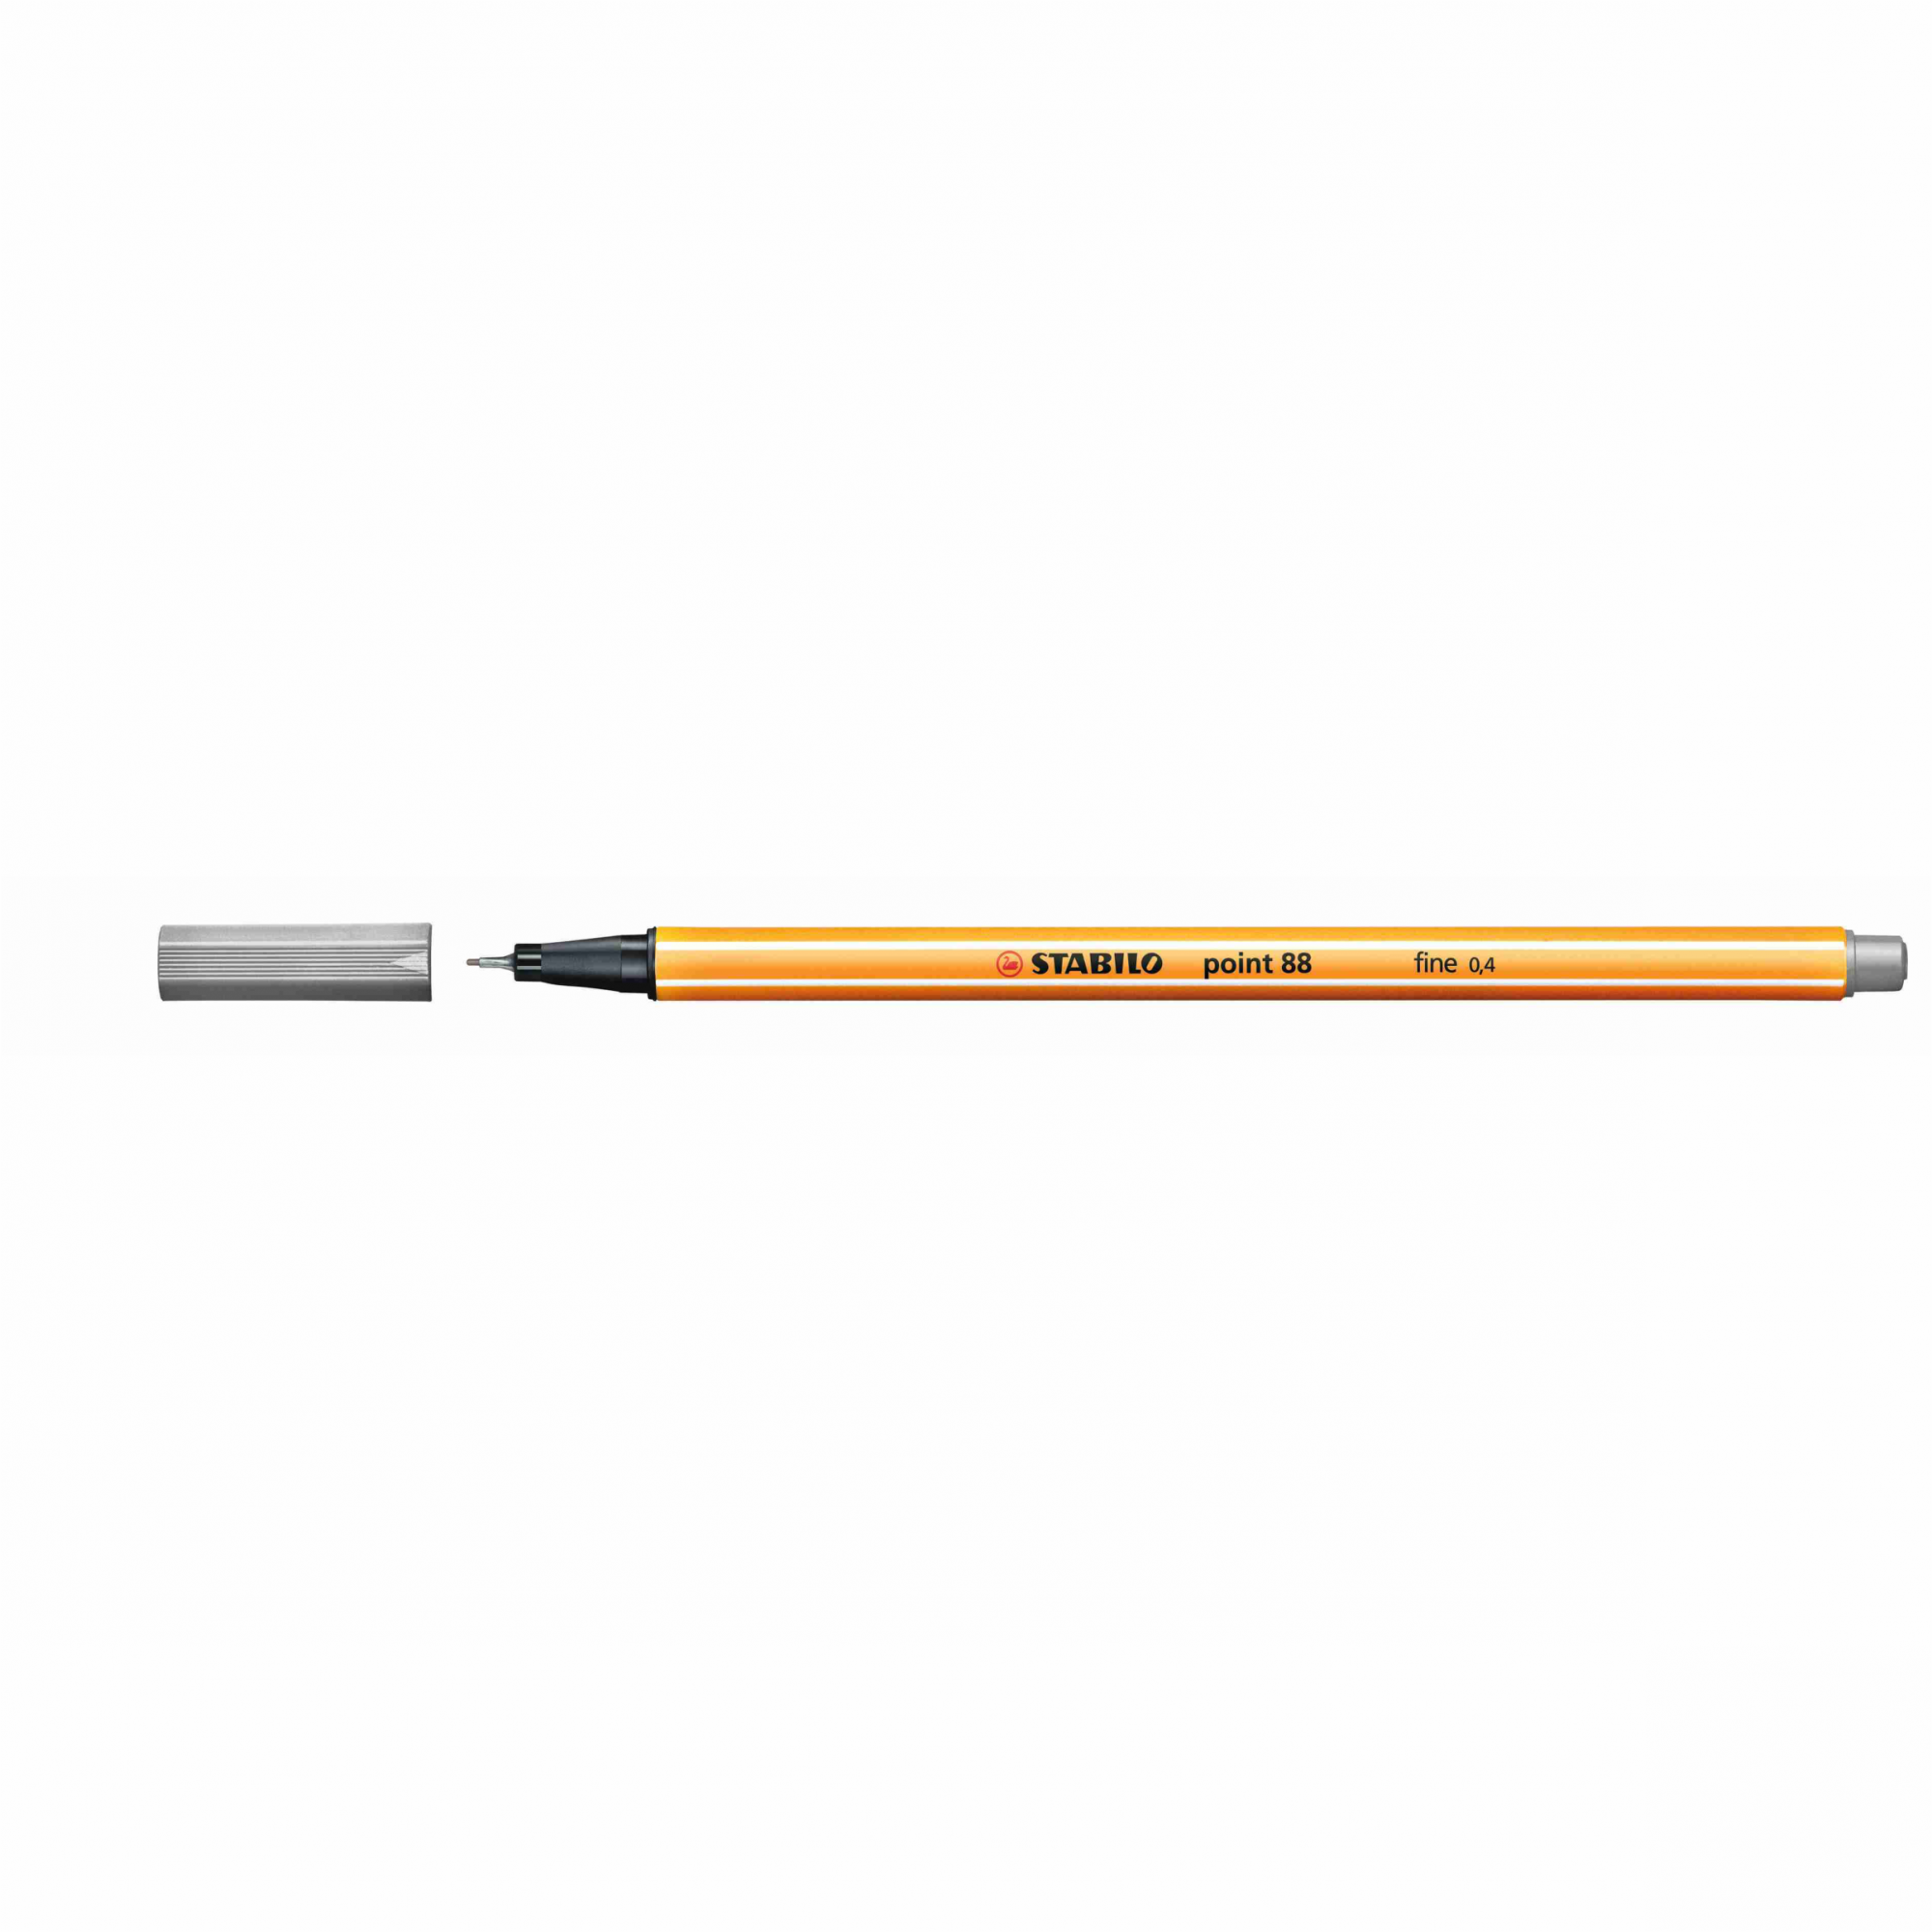 Caneta Hidrográfica 0.4 cinza claro POINT 88 Stabilo